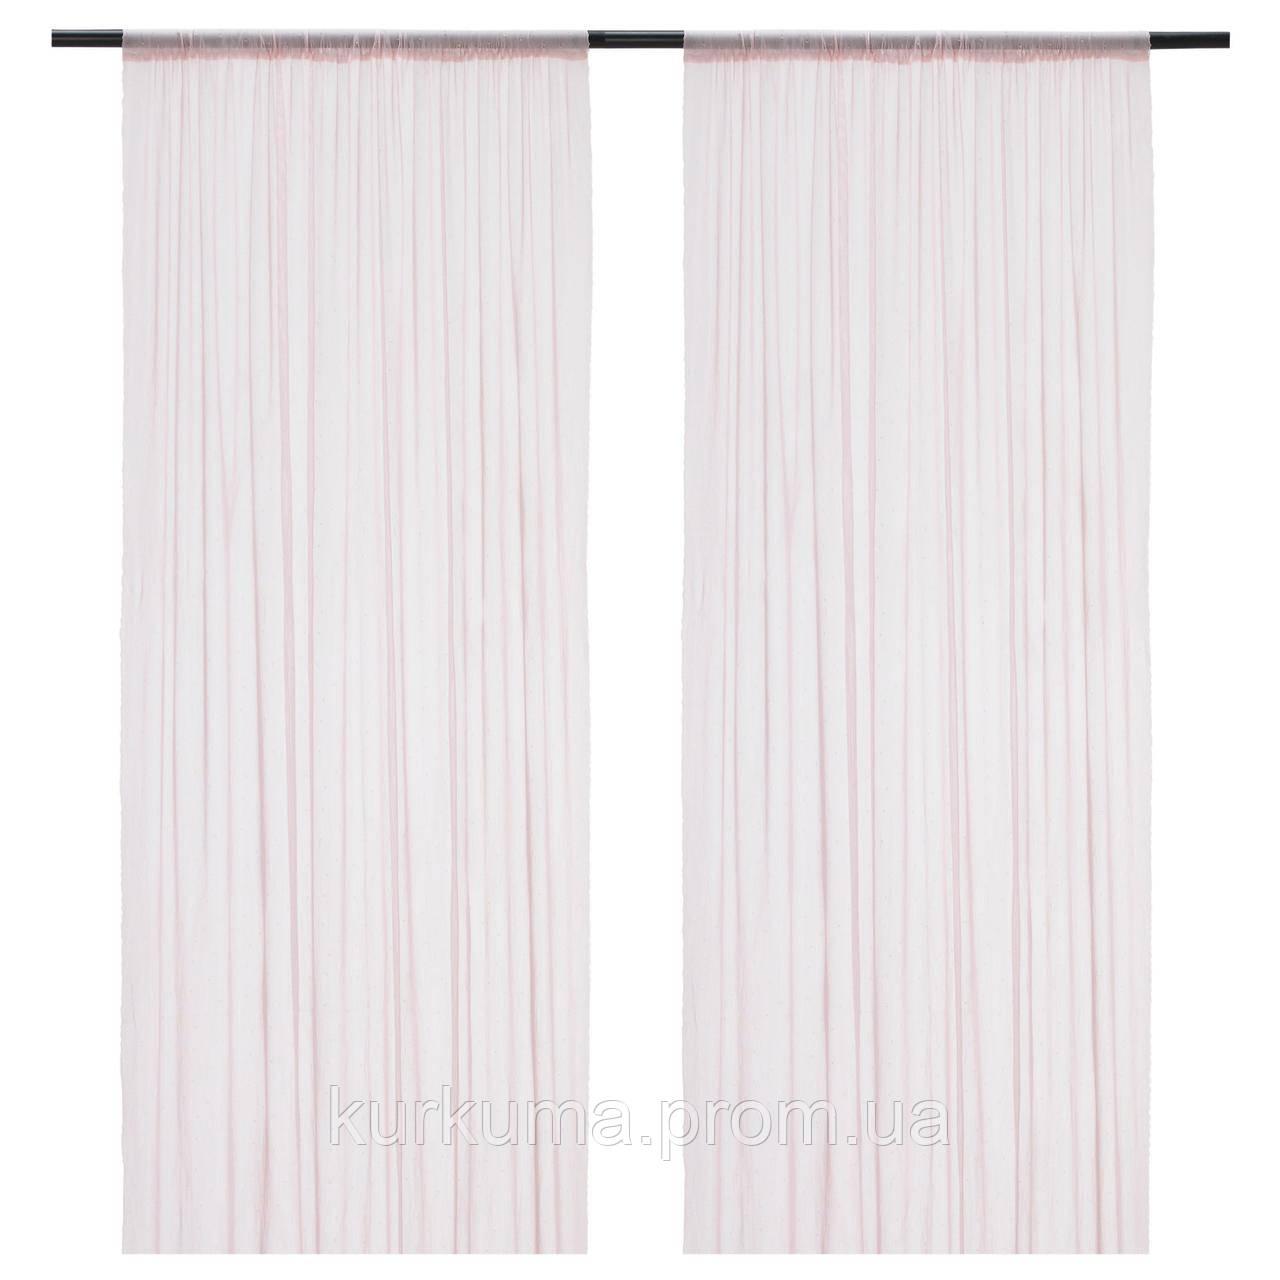 IKEA HILDRUN Тюль, 1 пара, розовый, пунктирная  (503.916.52)